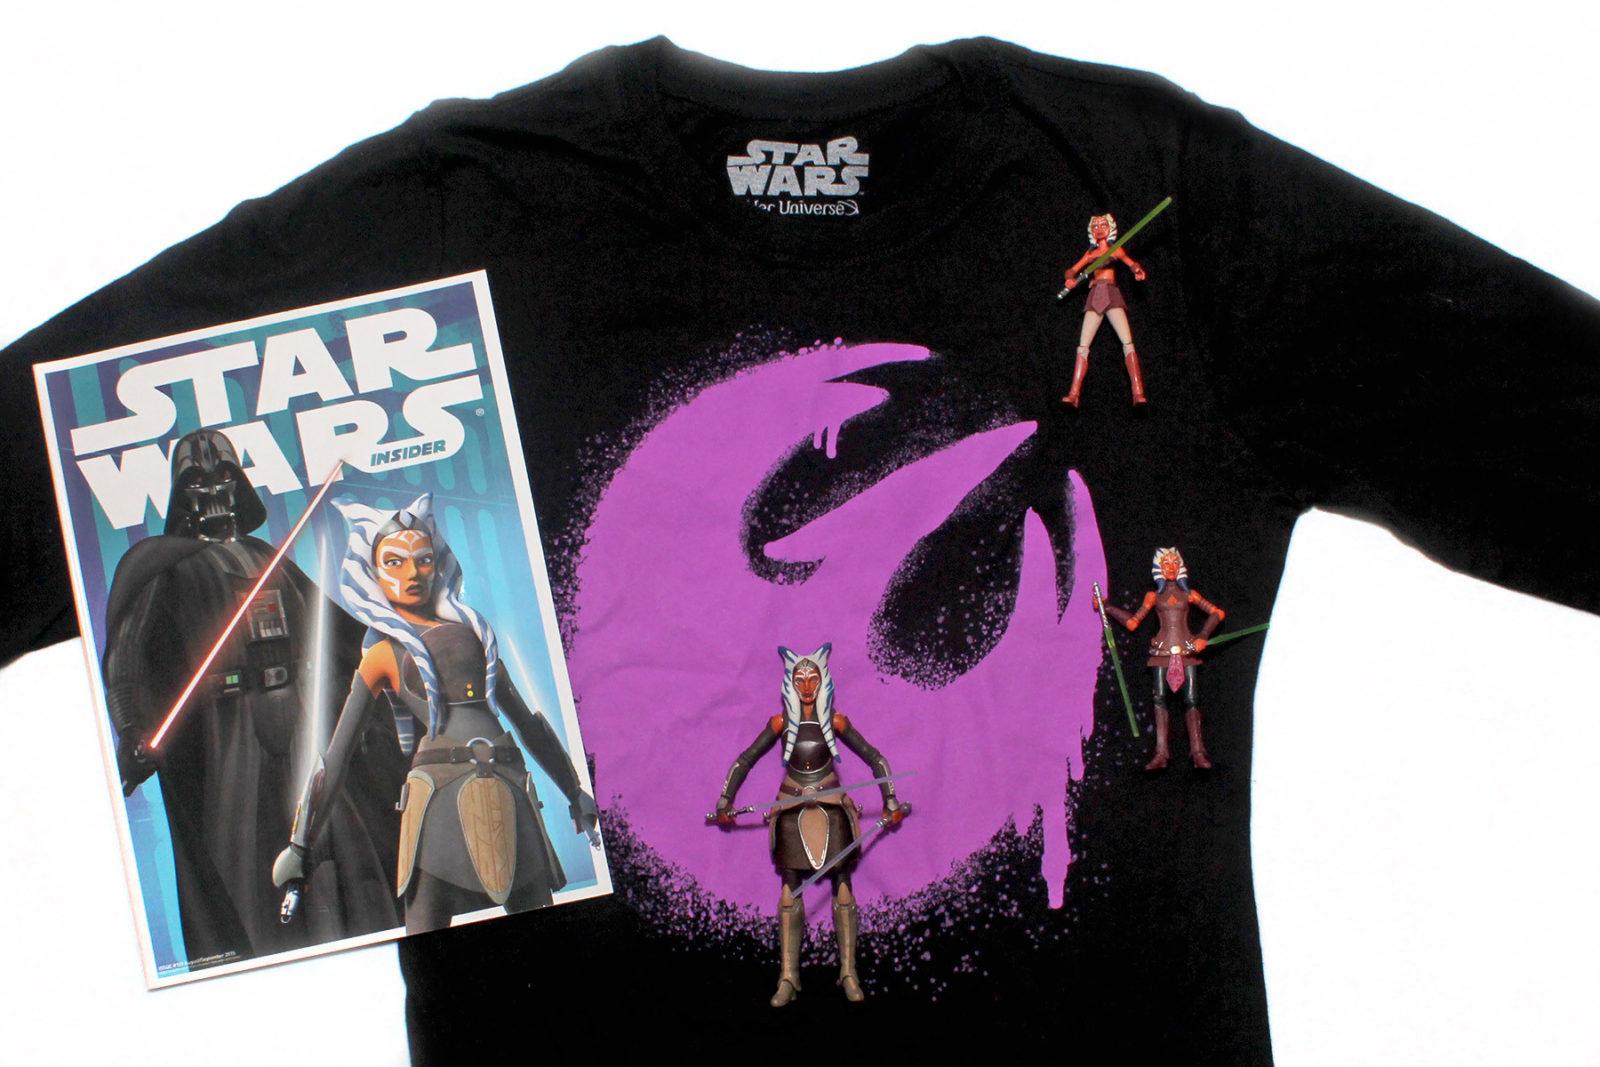 Ahsoka Lives Day 2016 - Her Universe Rebels top and Ahsoka figures